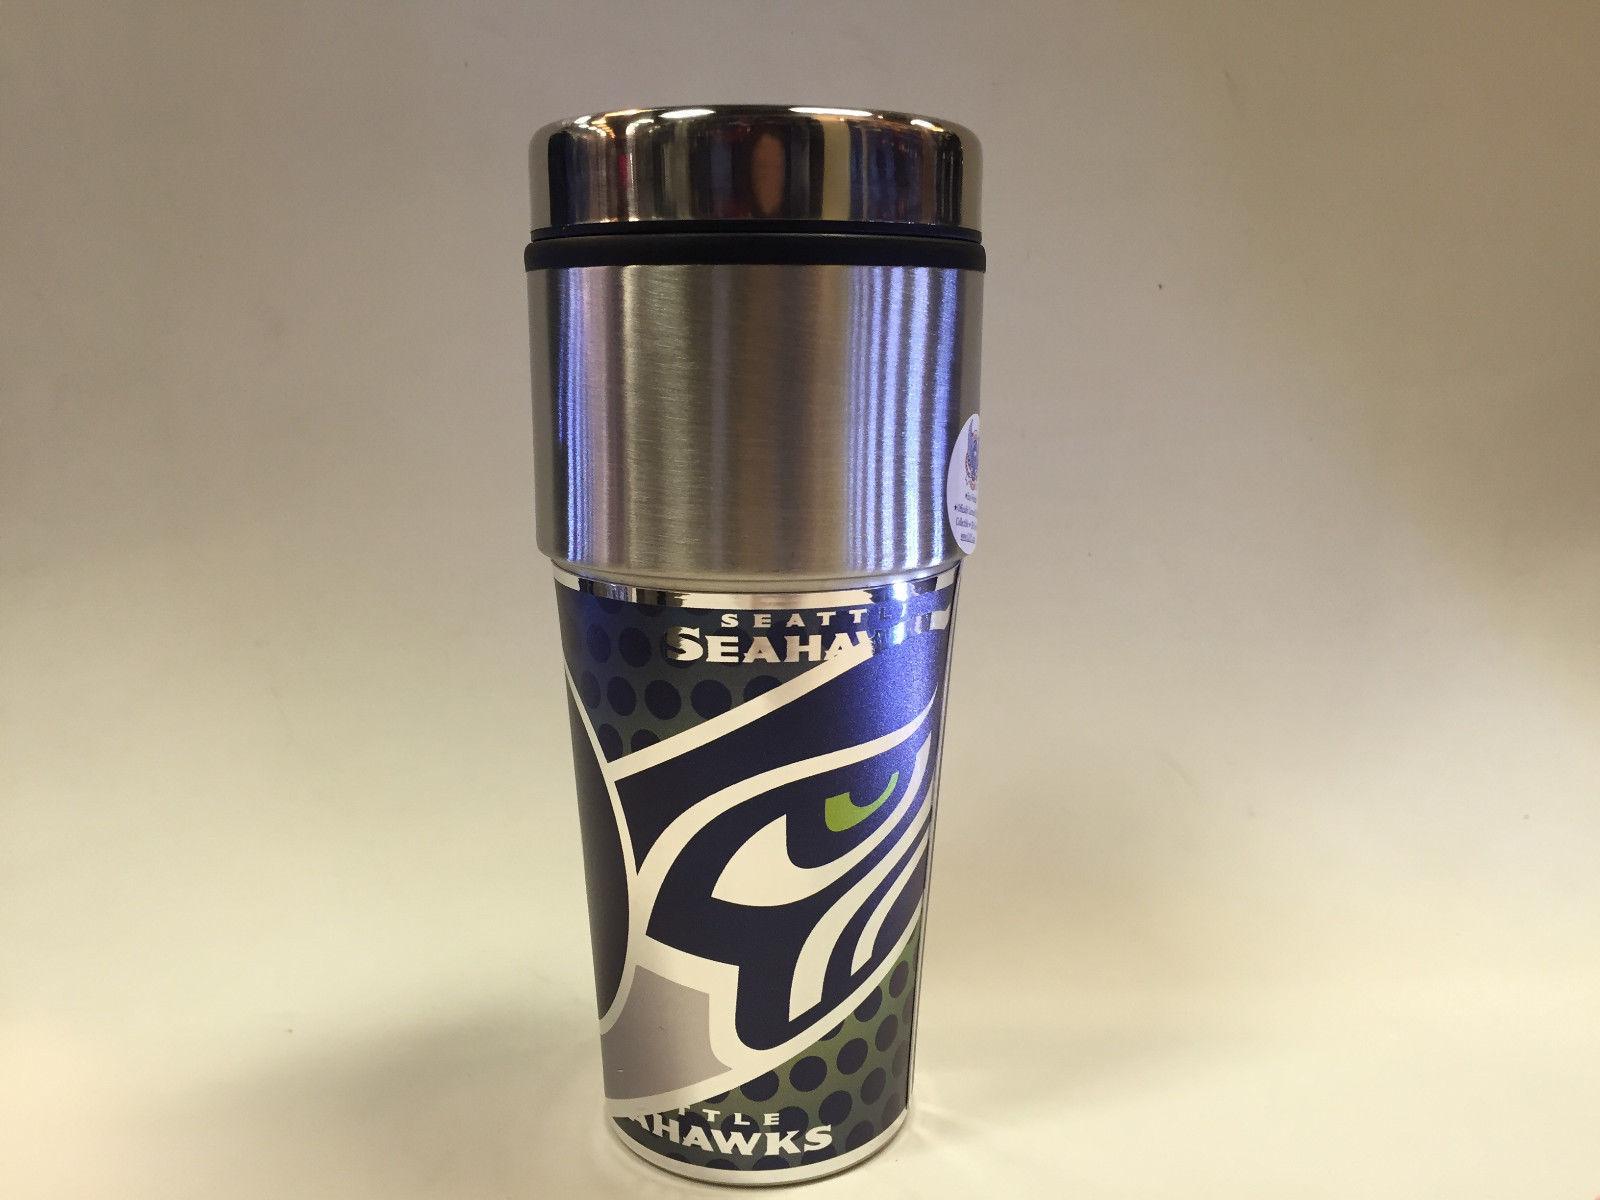 NFL Seattle Seahawks 360 Wrap Travel Tumbler Coffee Mug 13259